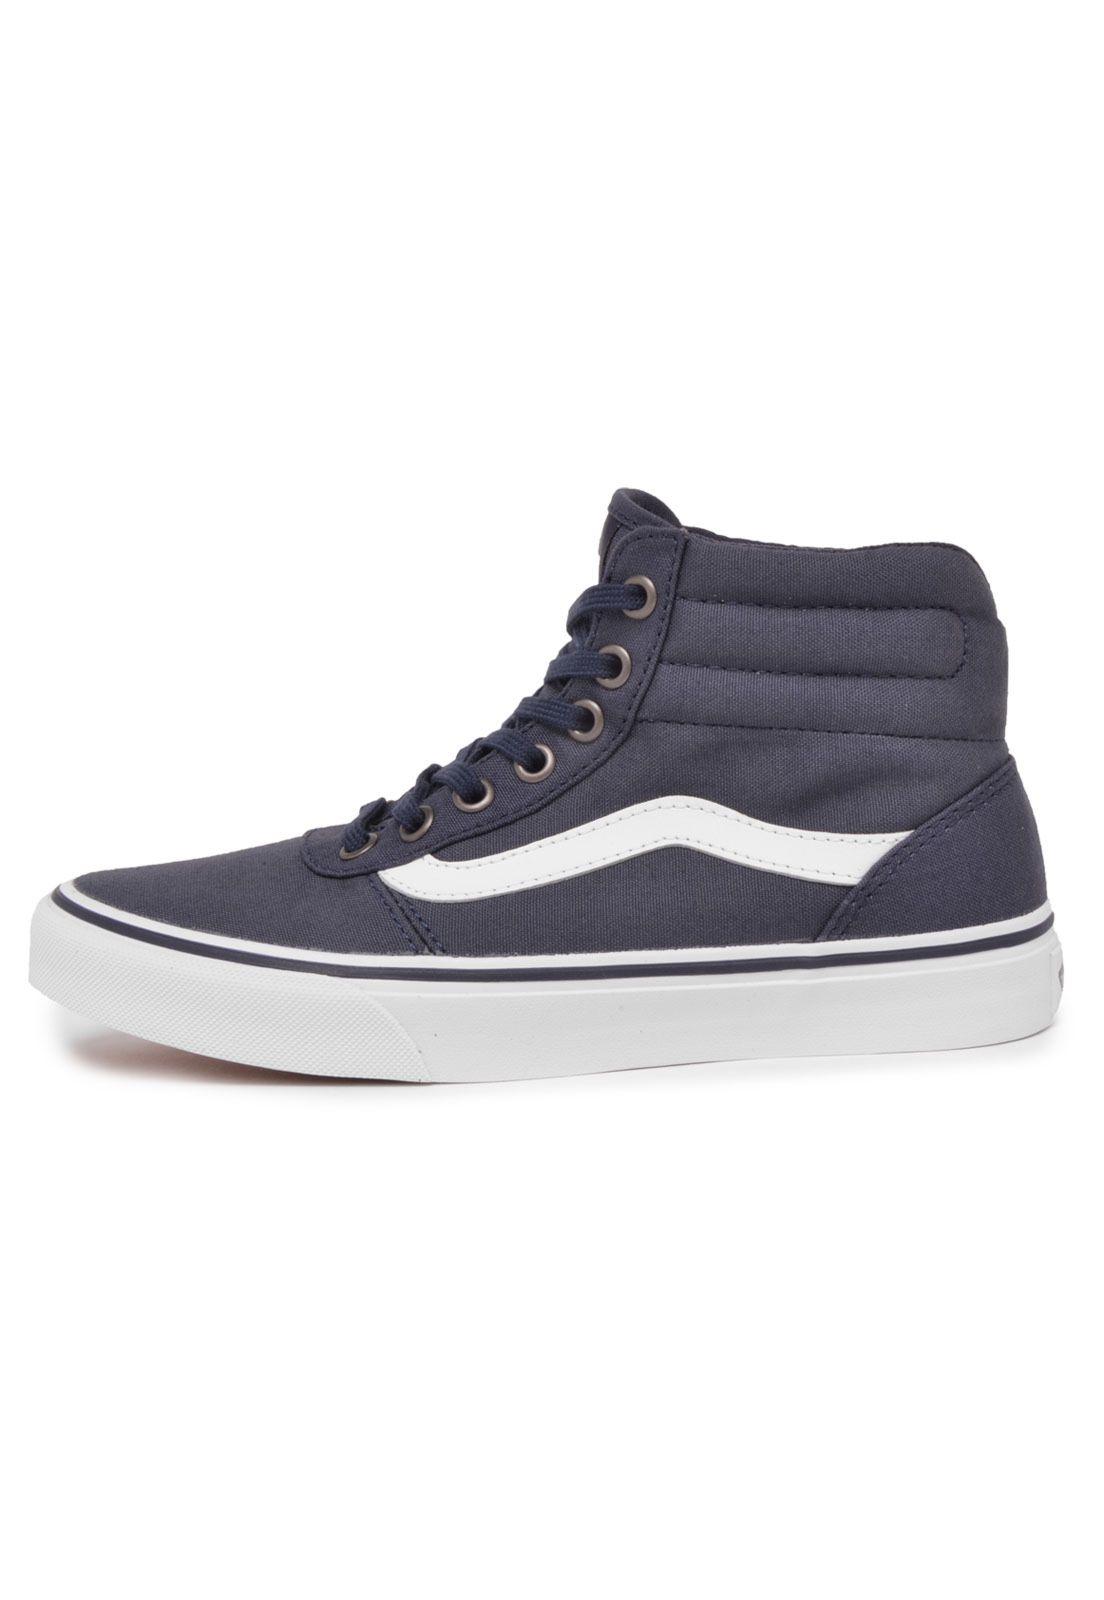 6dc11f028ba Tênis Vans Milton HI Recorte Azul-Marinho Branco